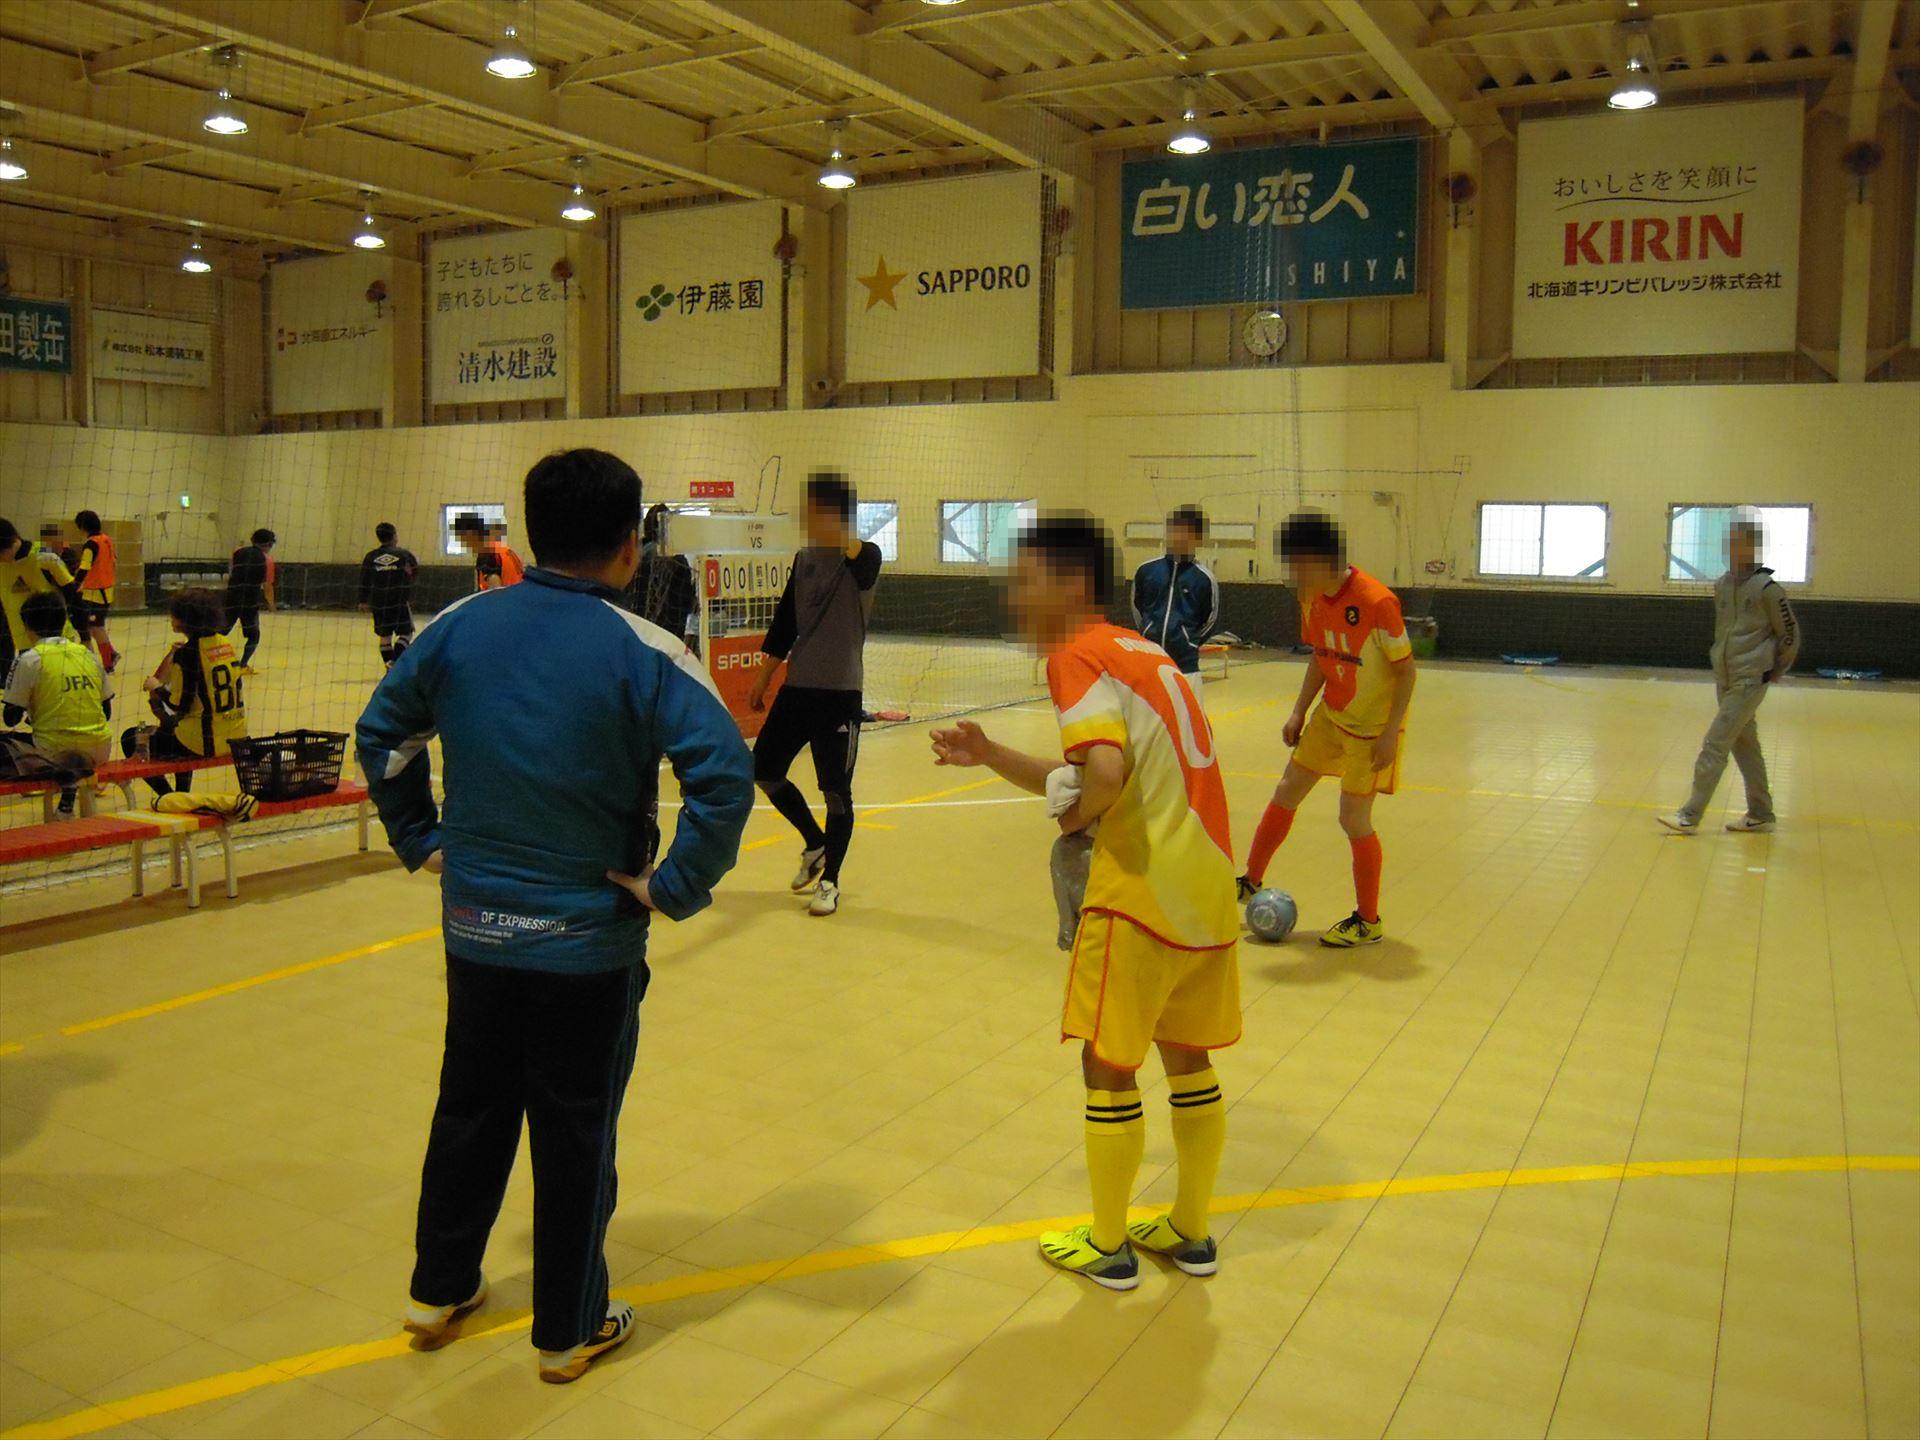 futsal-play-201504.jpg